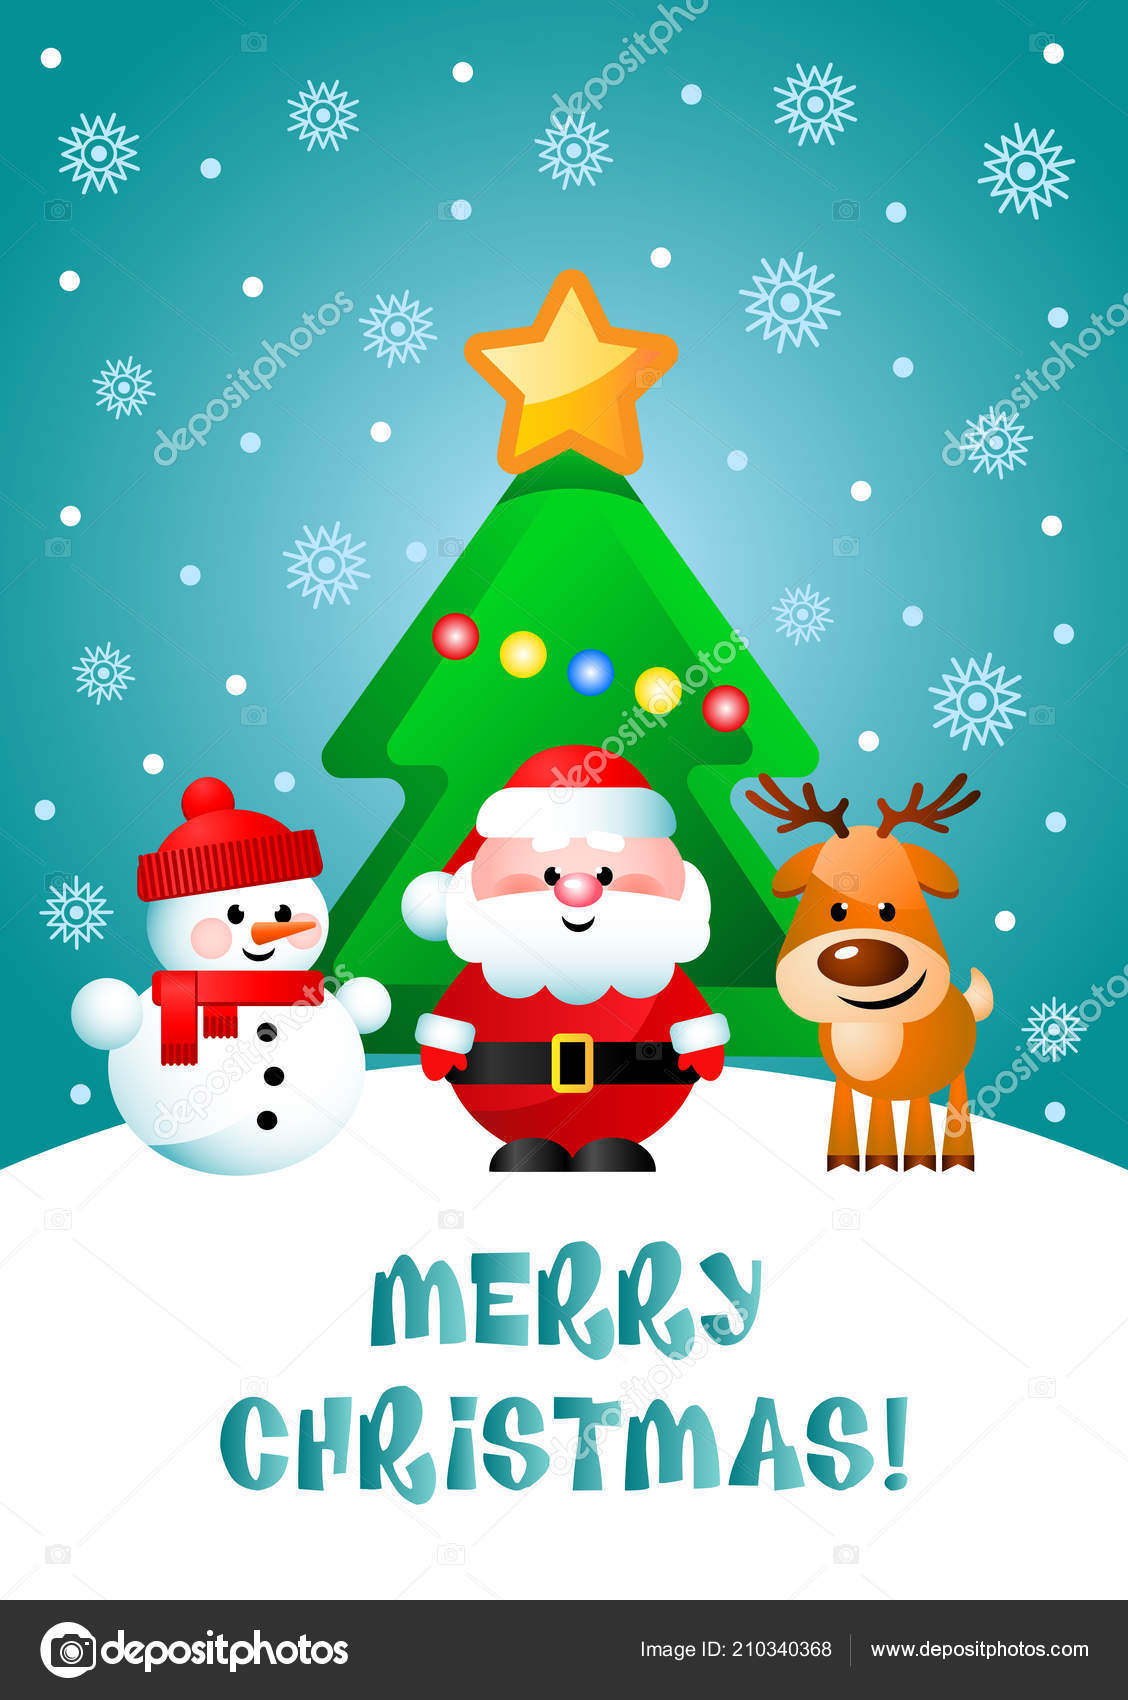 Christmas Greeting.Merry Christmas Greeting Card Cute Cartoon Characters Santa